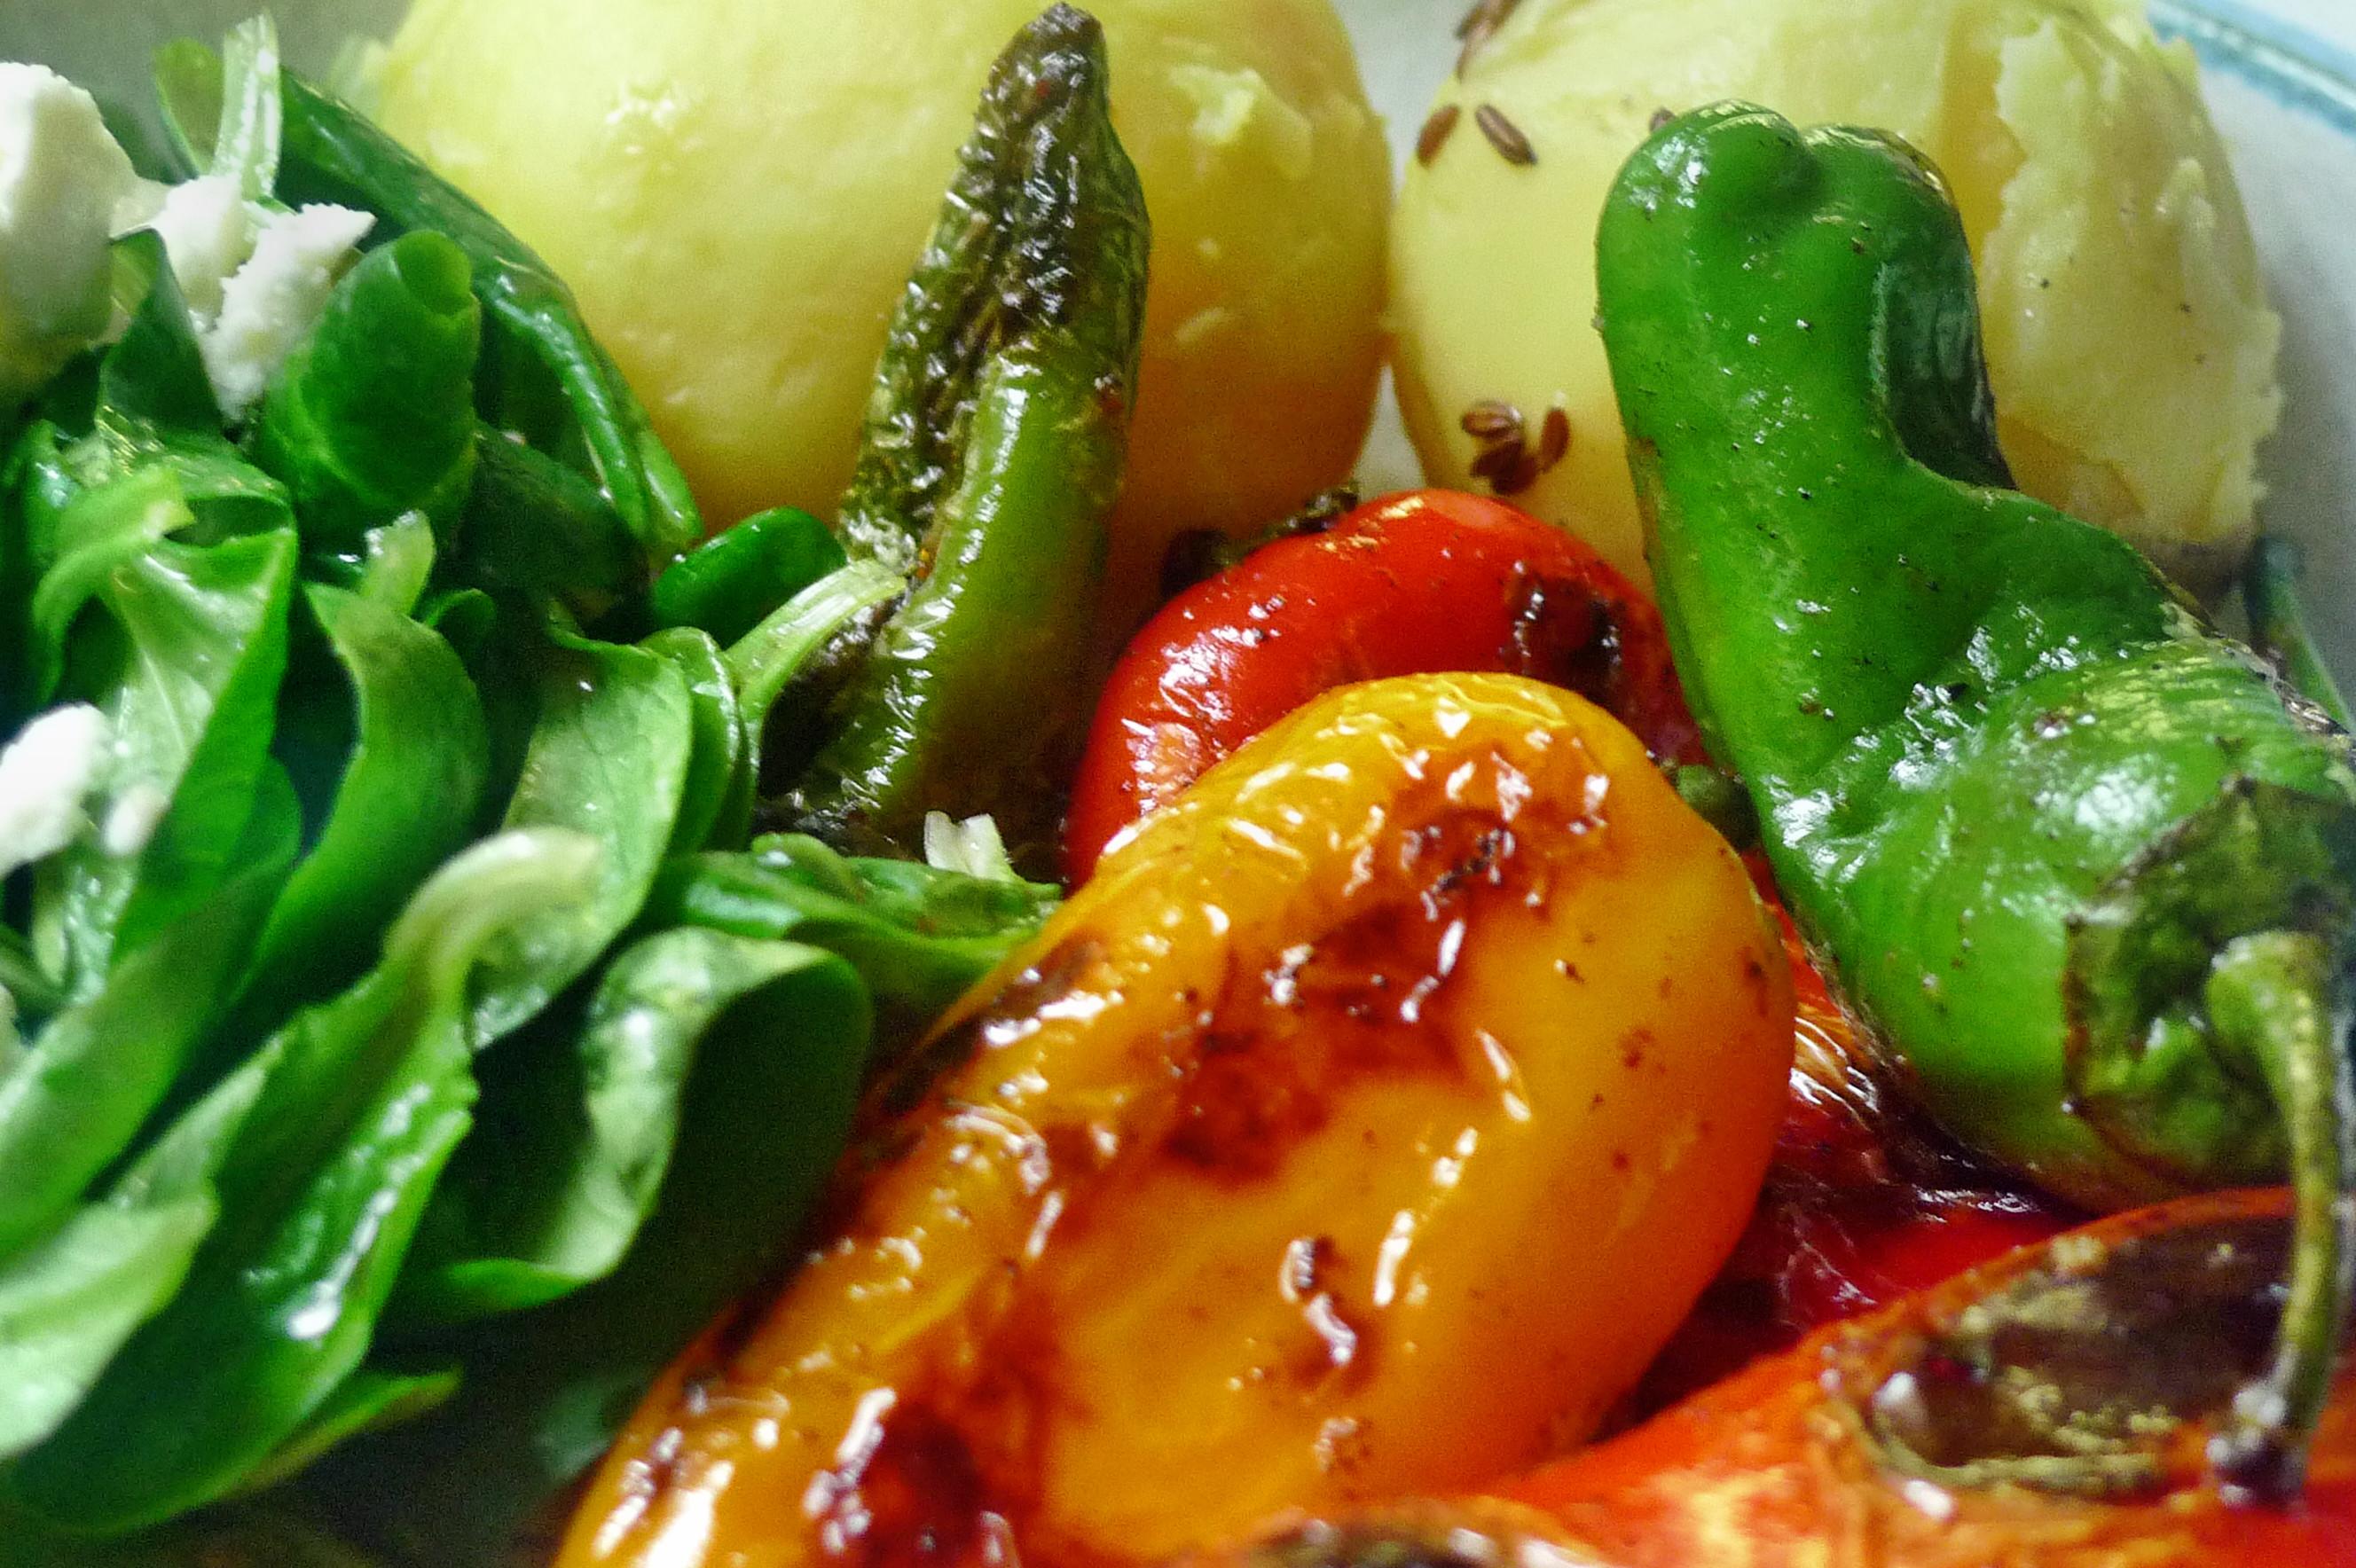 Pimentos-Paprika-Kartoffel-Salat-Buttermilch- 28.9.14   (14)